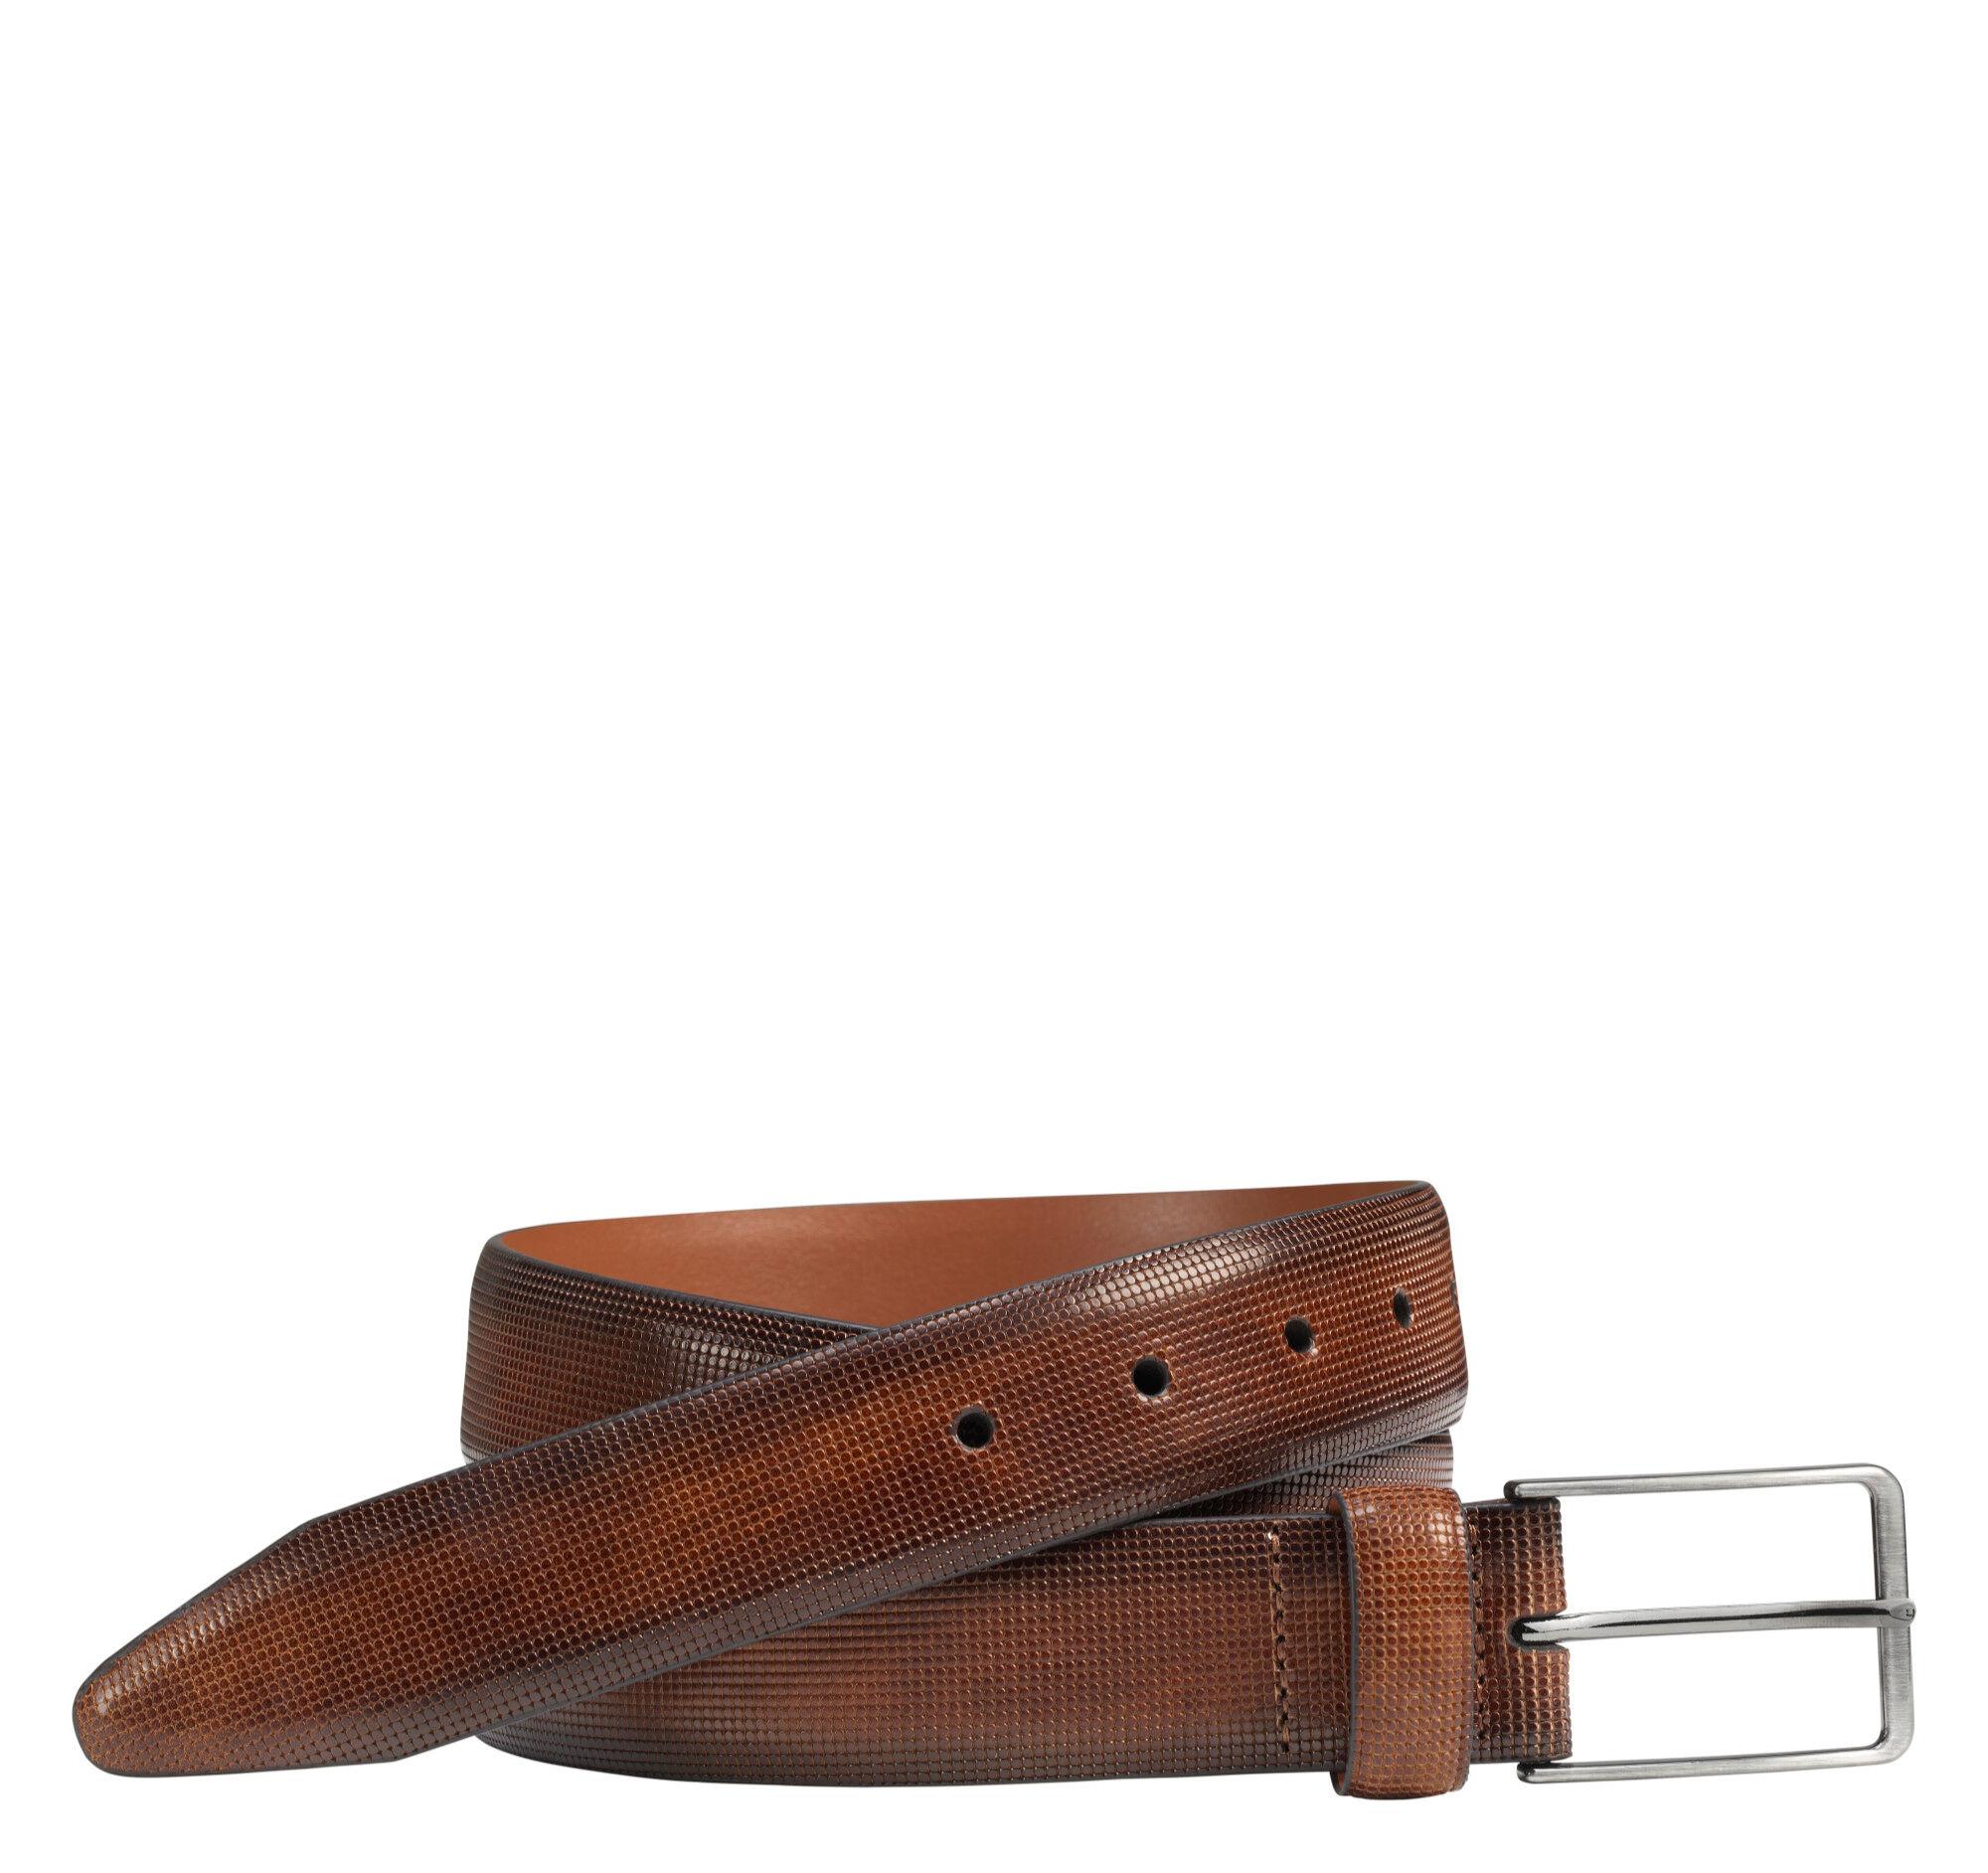 Johnston & Murphy Men's Mini Embossed Belt - Brown - Size 34